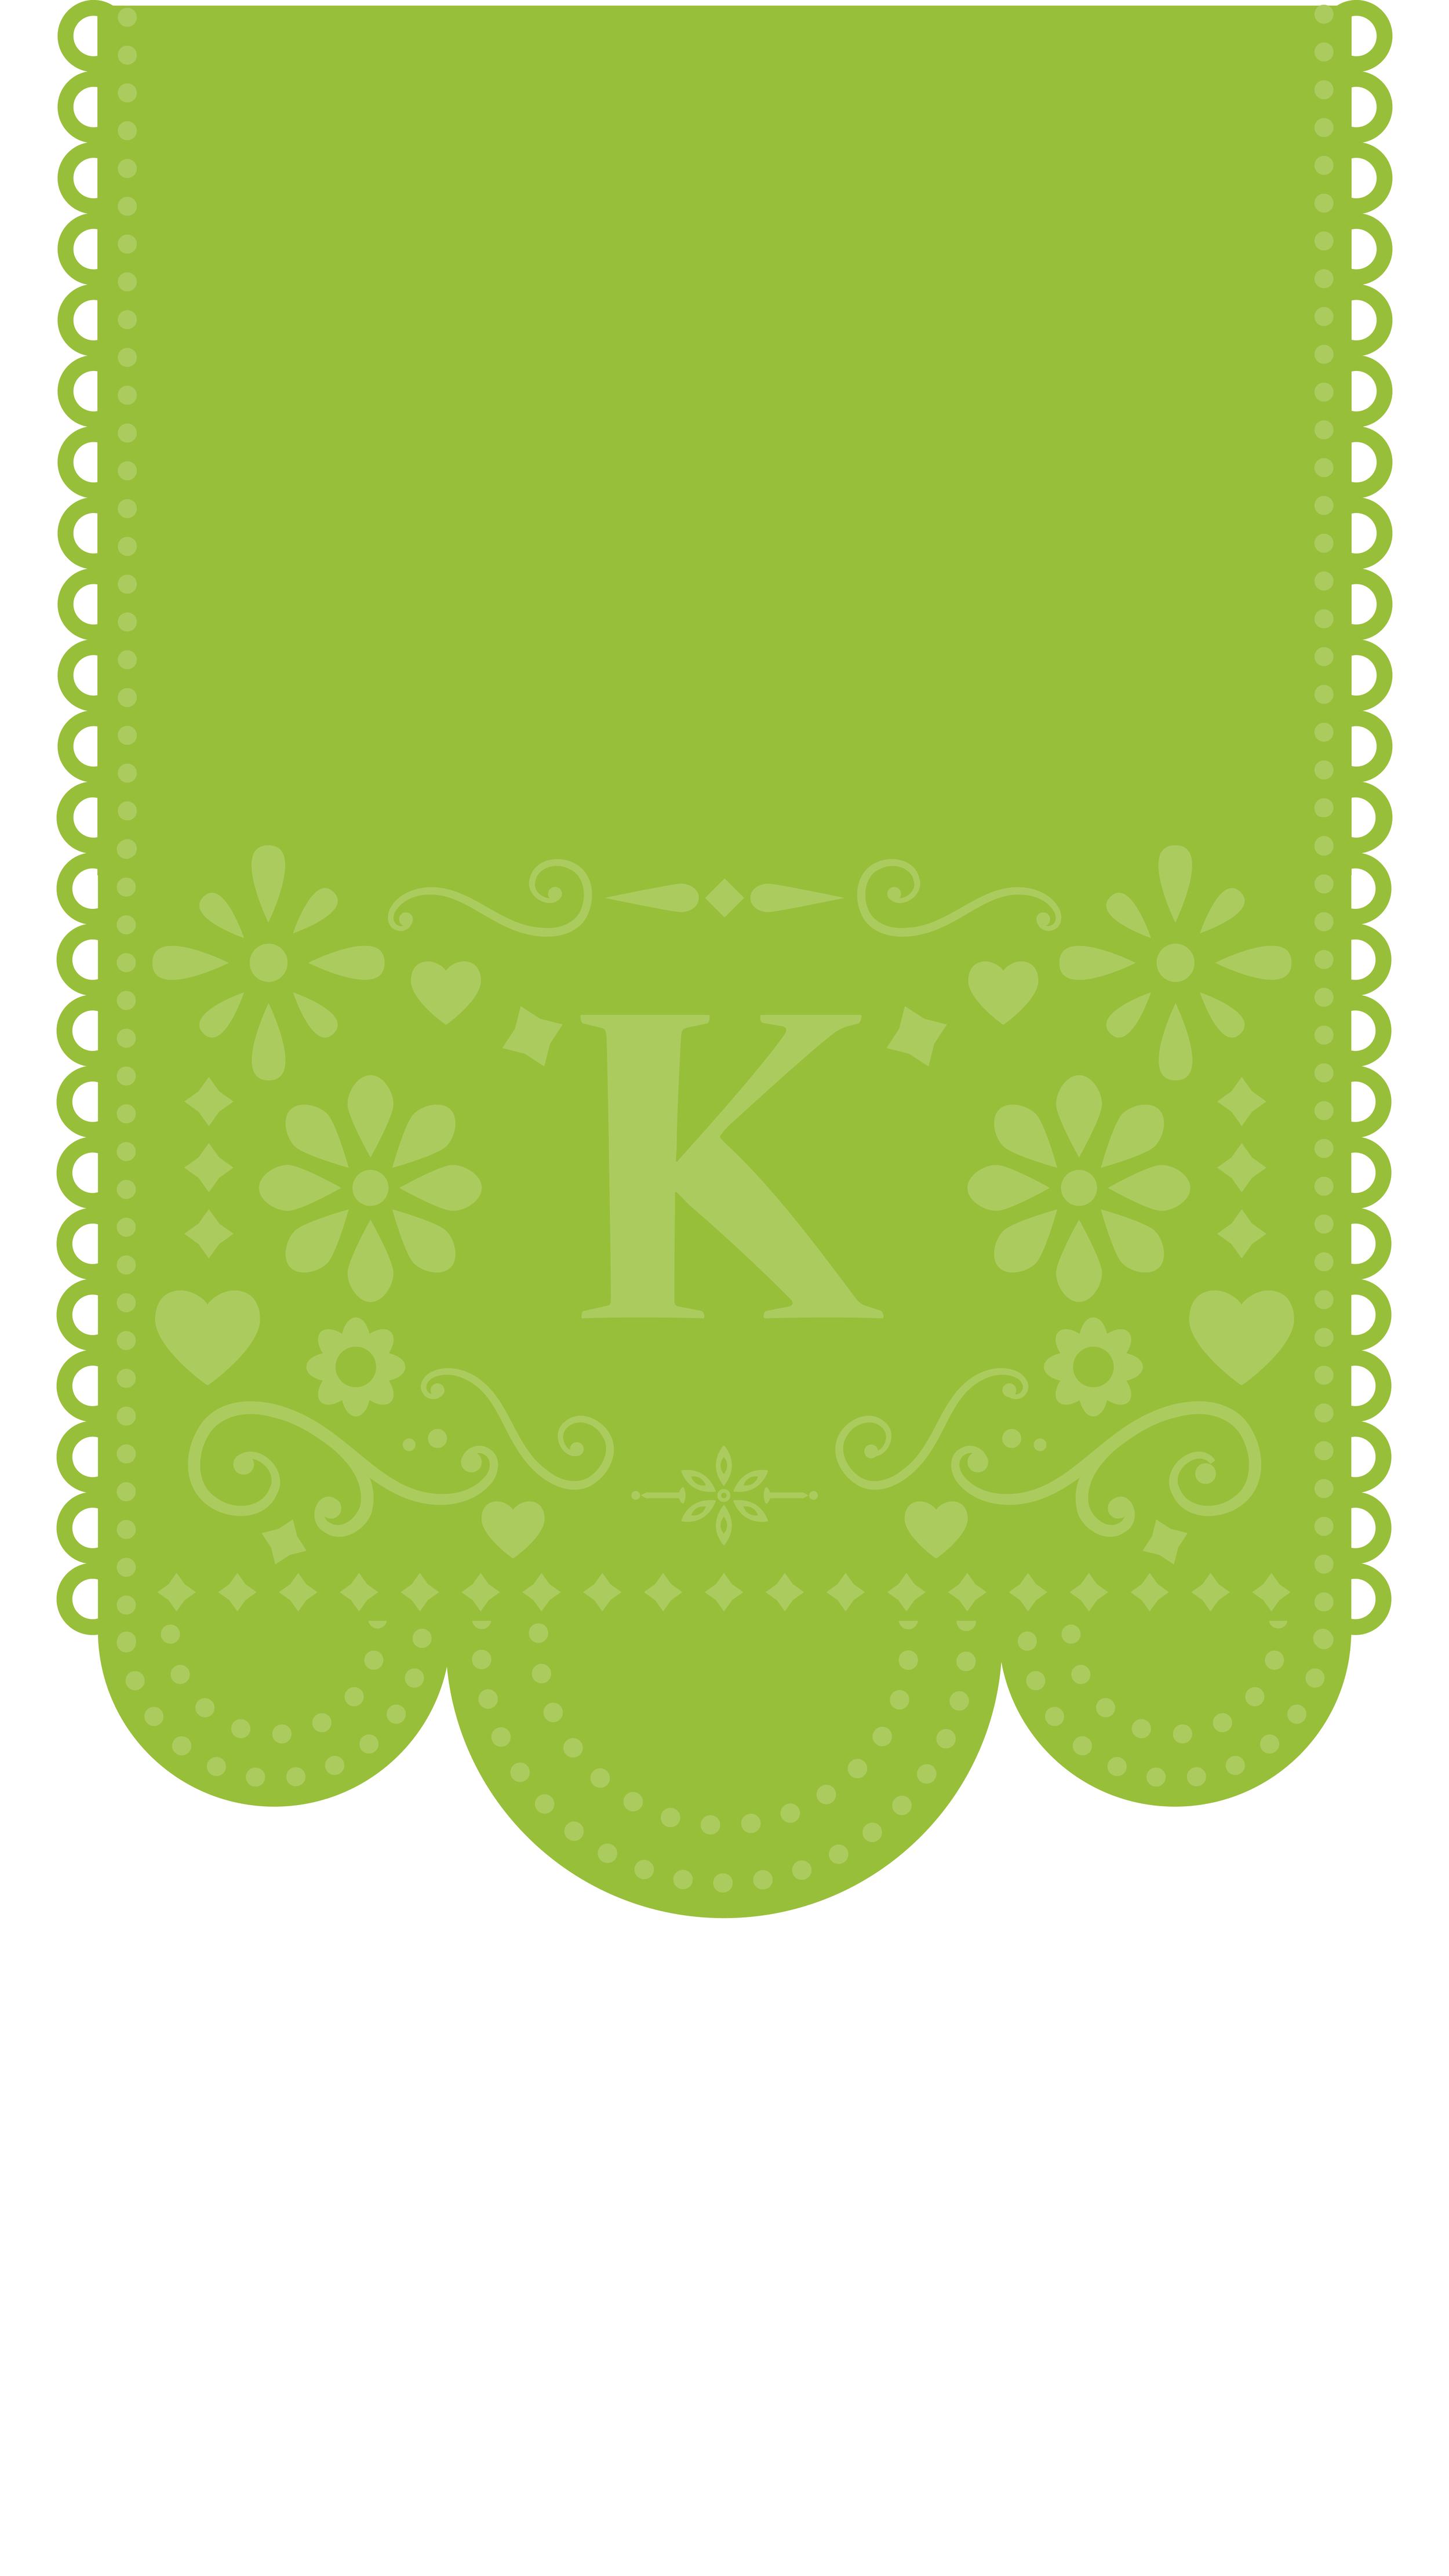 k-fiesta-banner.png